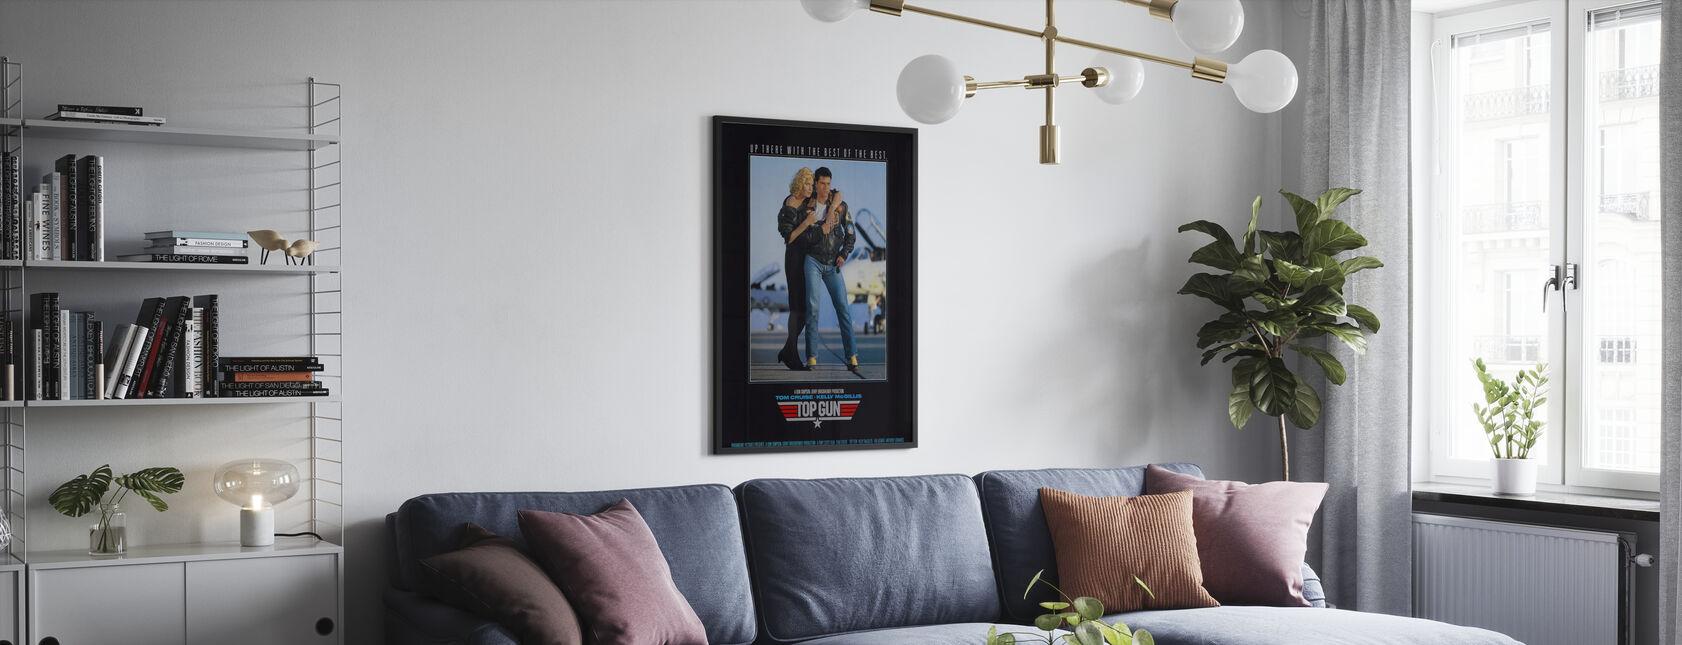 Top Gun - Poster - Living Room